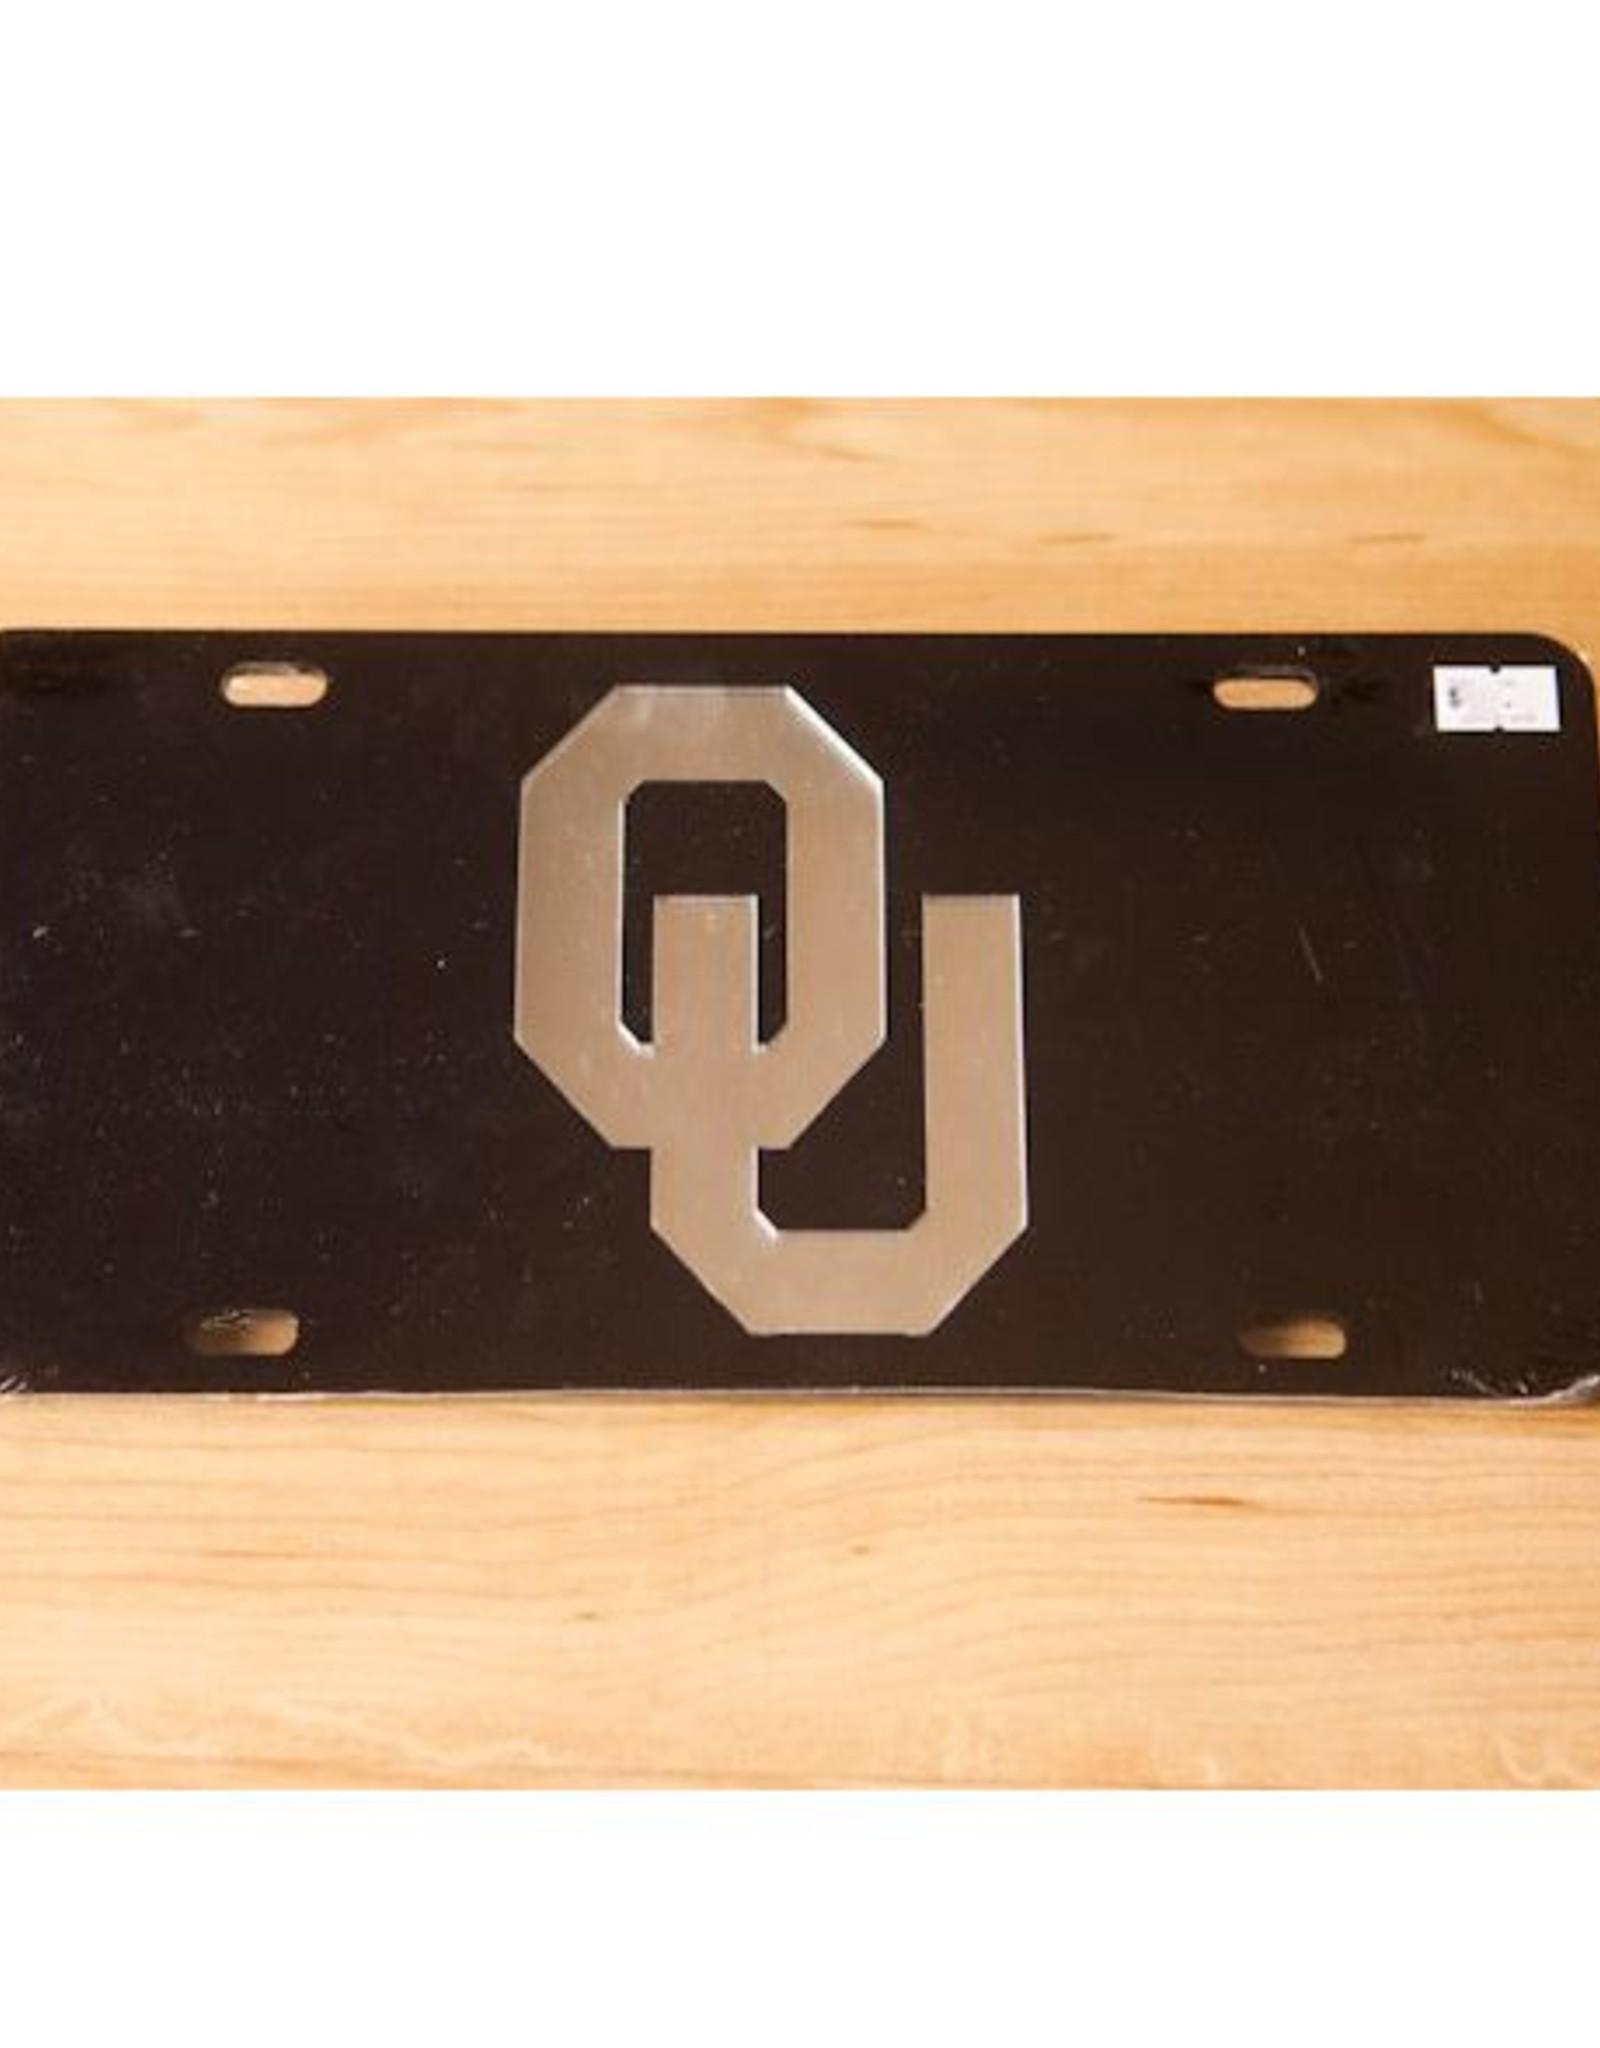 Craftique Craftique OU Silver/Black Mirrored License Plate